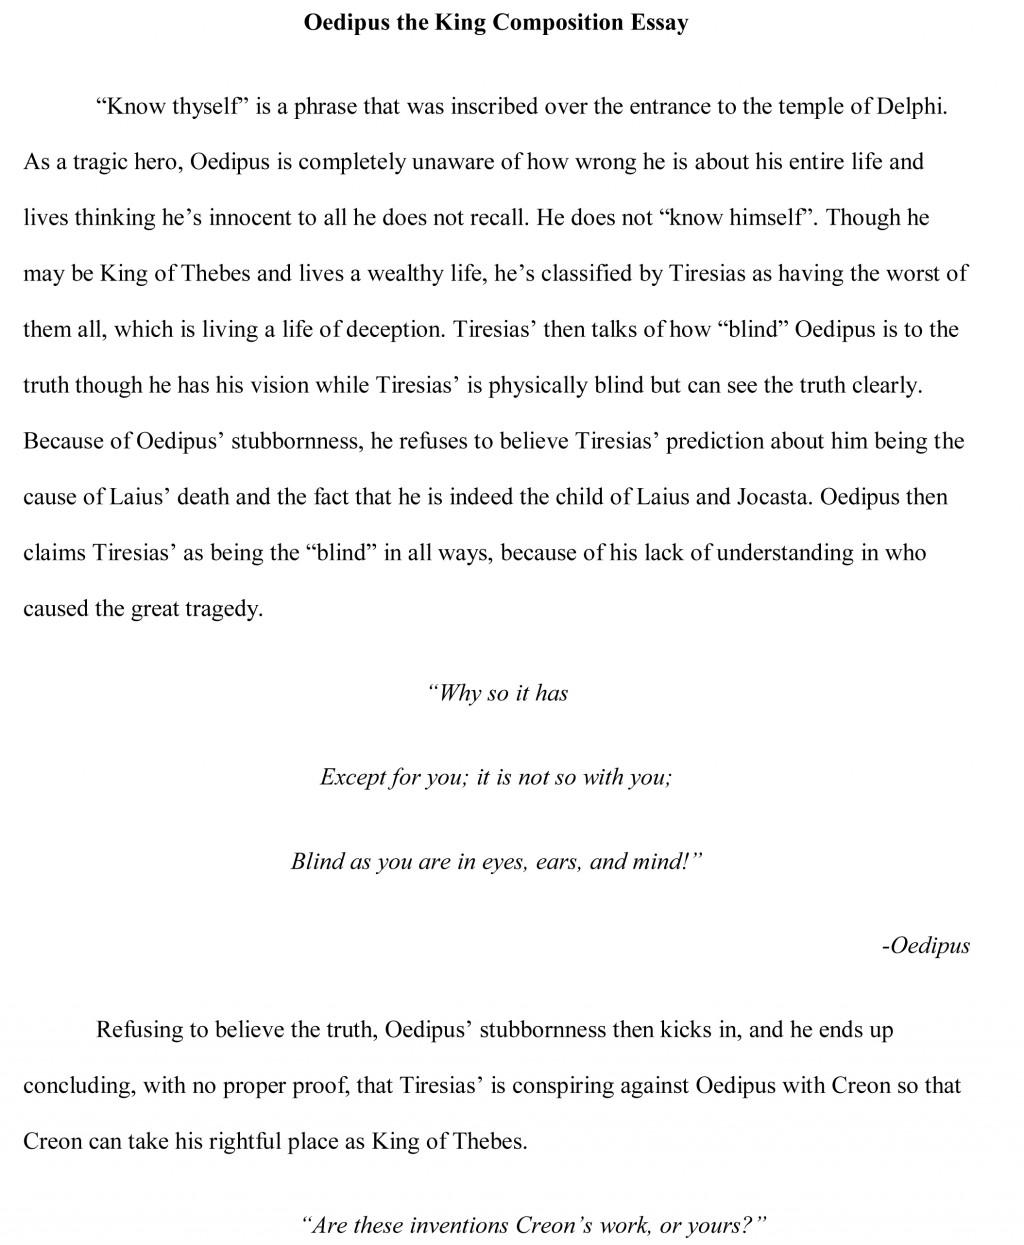 007 Essay Example Reworder Oedipus Free Magnificent Best Rewriter Software Download App Large